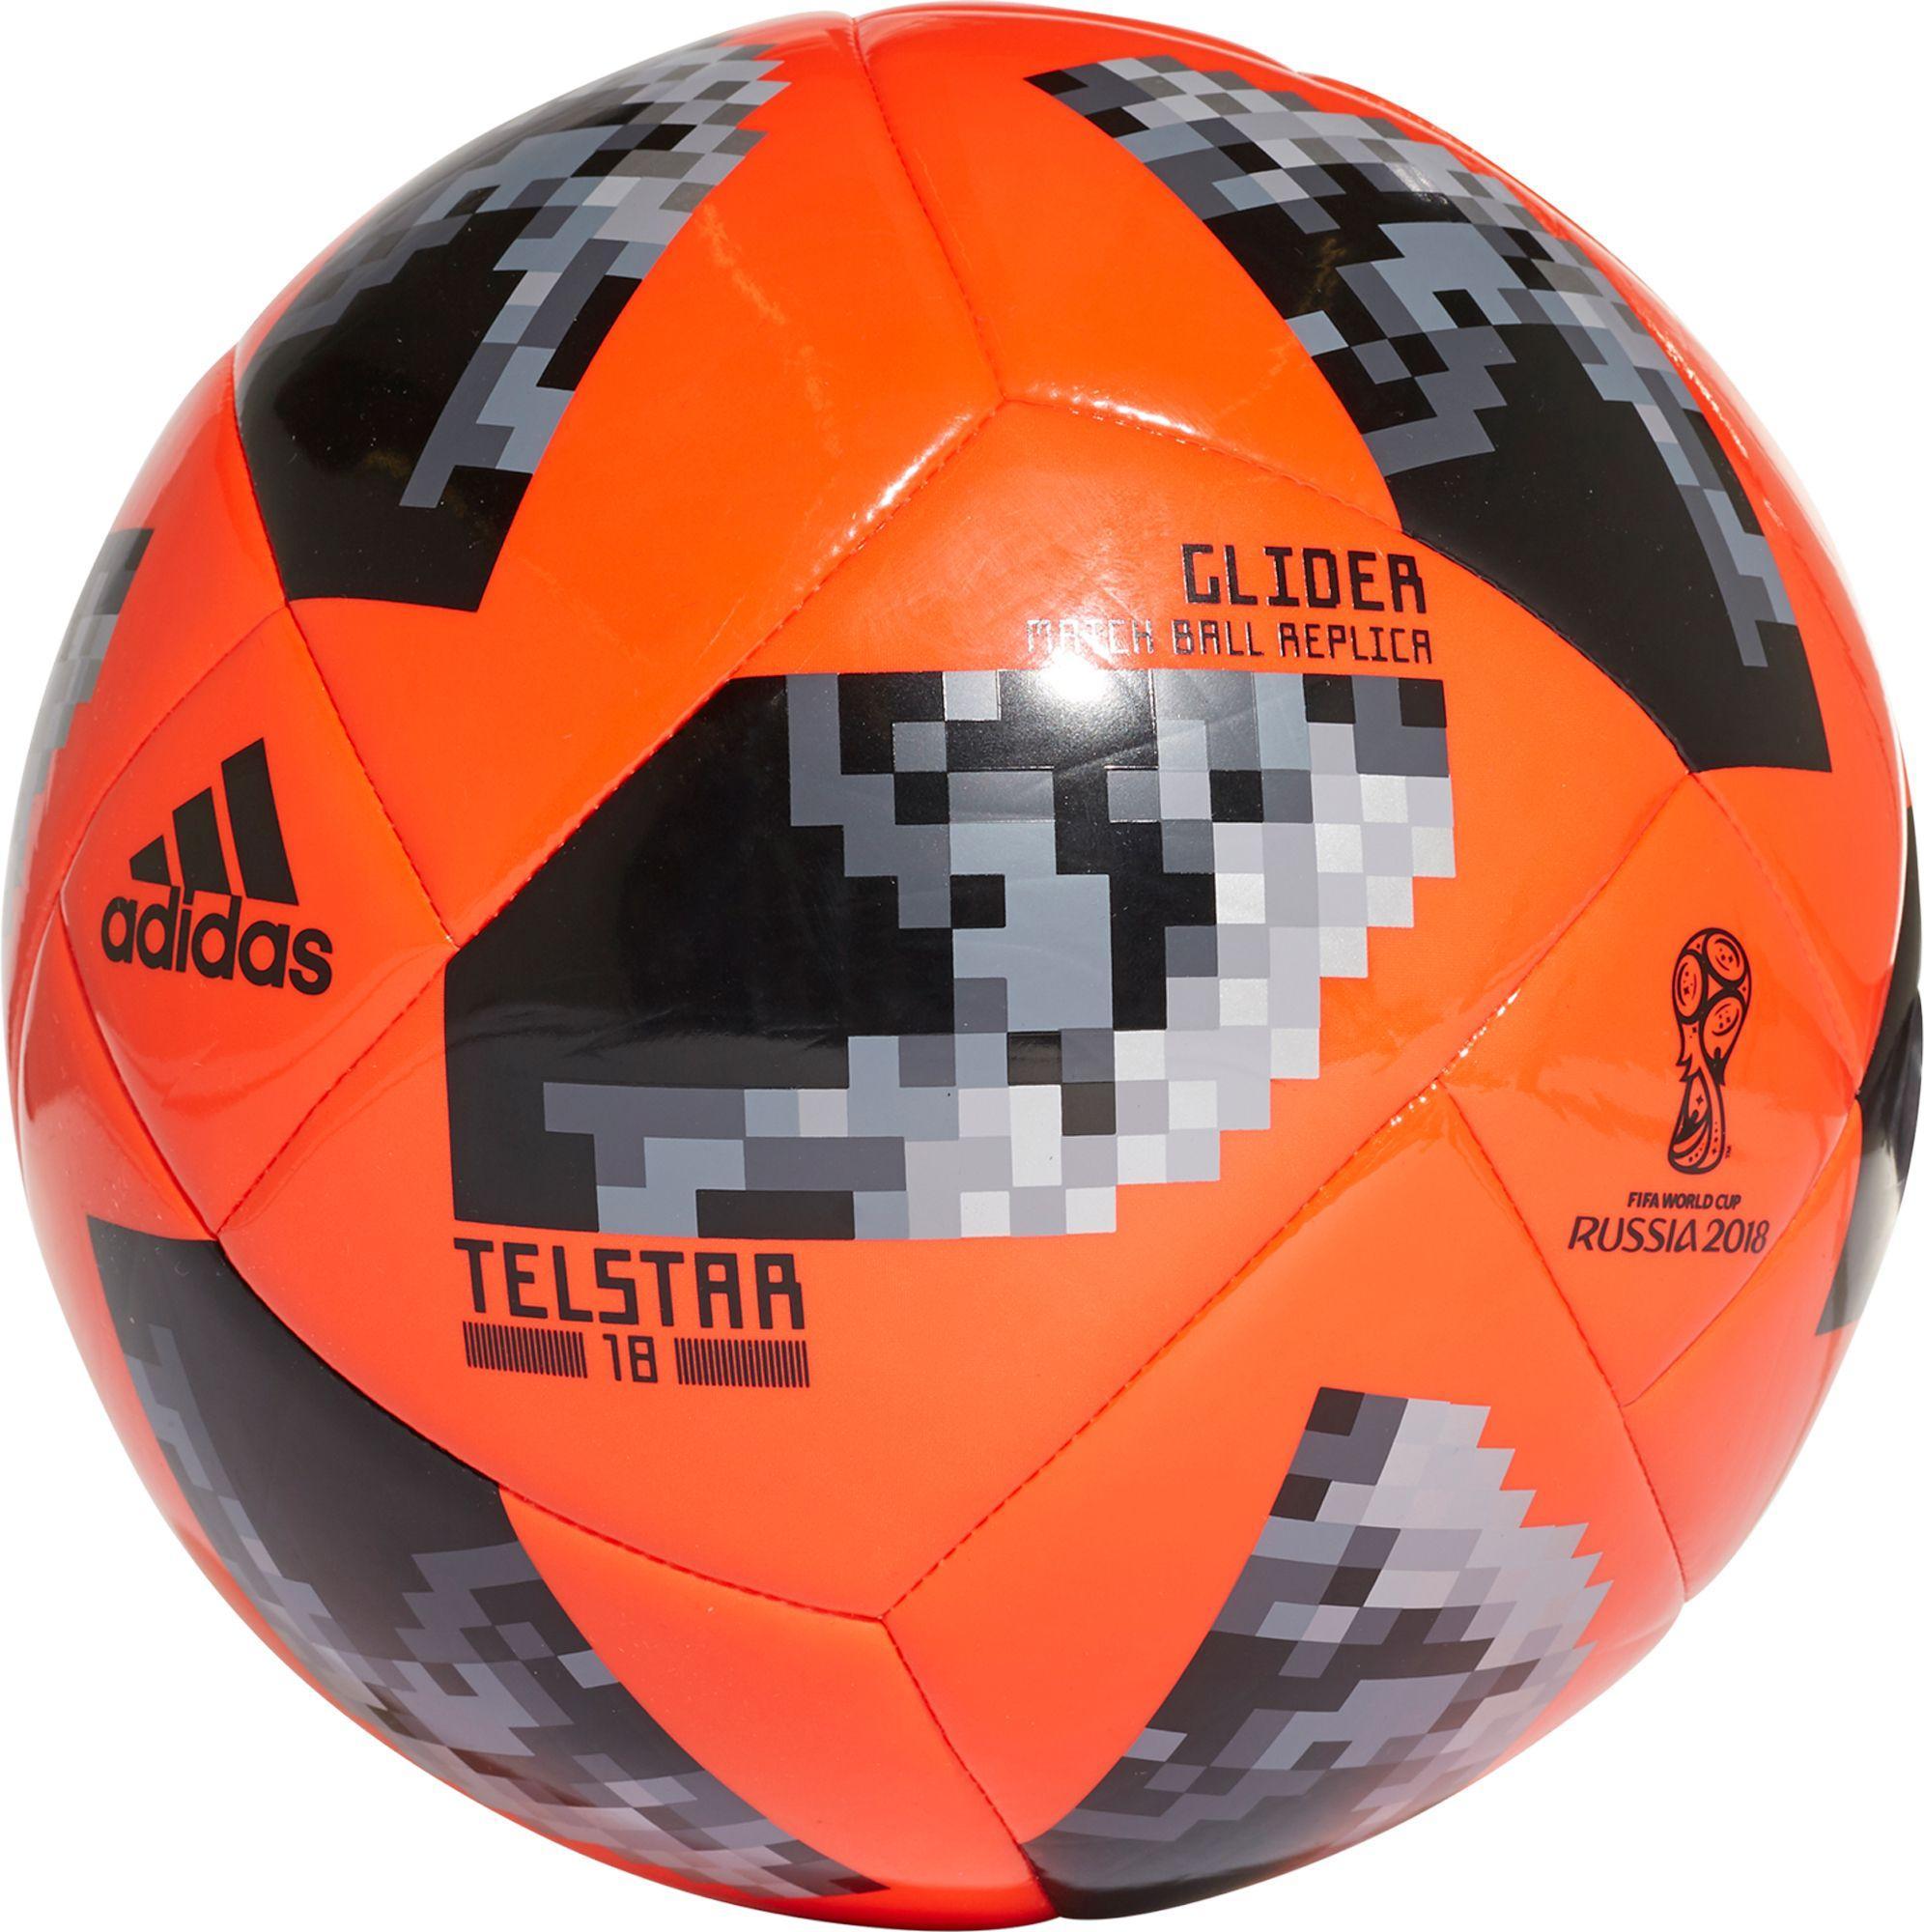 941d8a8d85 Bola Sepakbola Adidas Telstar World Cup SL CE8144 OriginalIDR345500. Rp  355.000